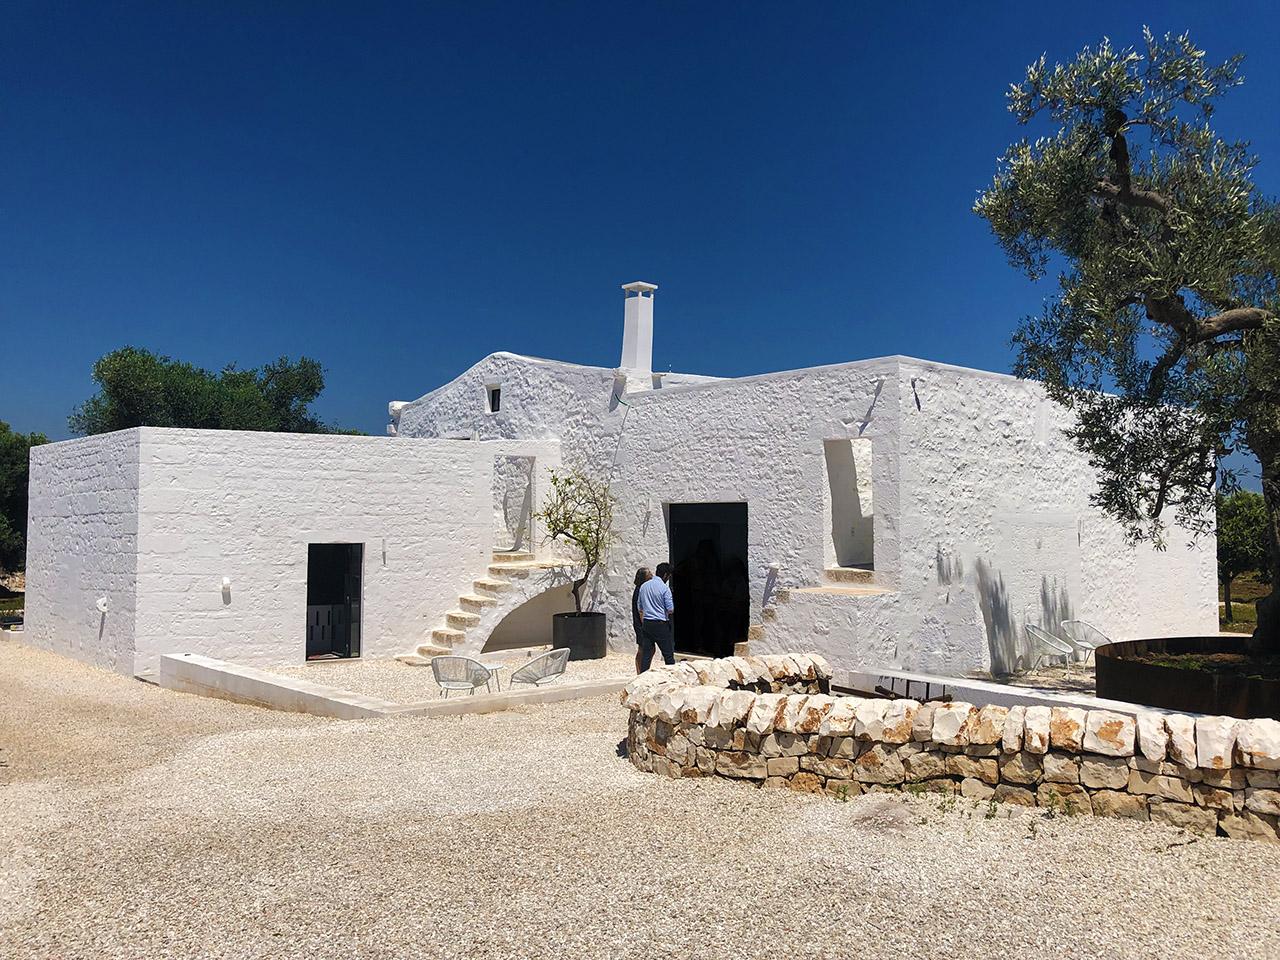 costruzioni restauri sirio ostuni restauro ristrutturazione masseria dagilupi ostuni img 8143